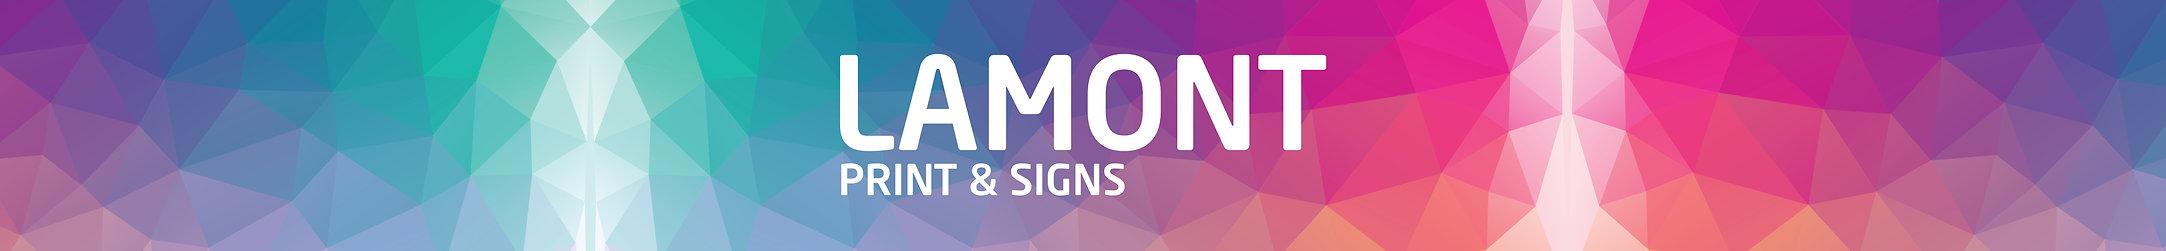 Lamont_Logo_WebsiteHeader.jpg